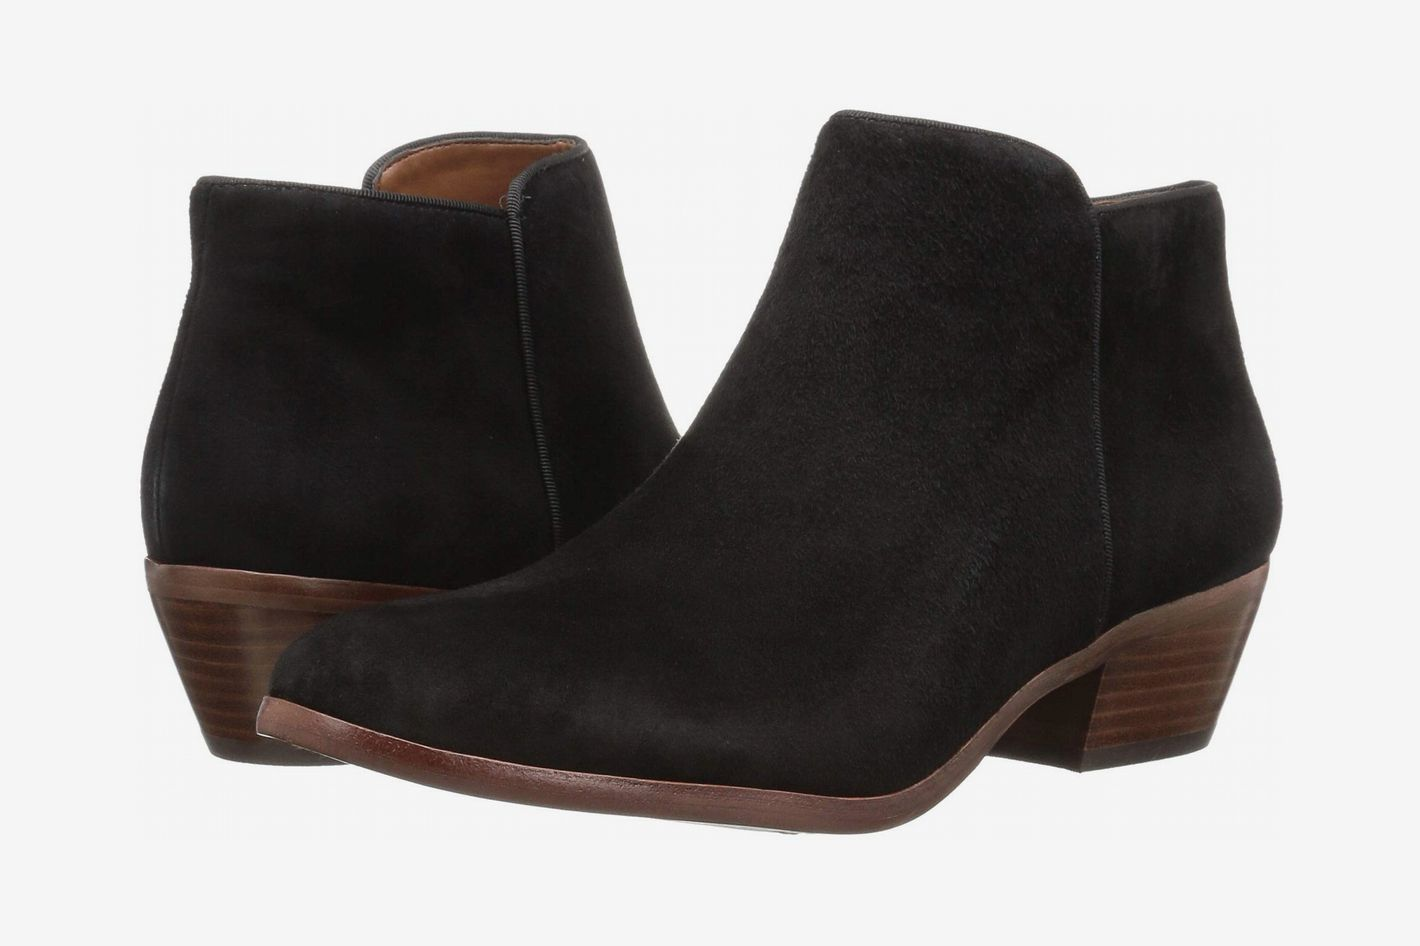 Sam Edelman Petty Ankle Boots